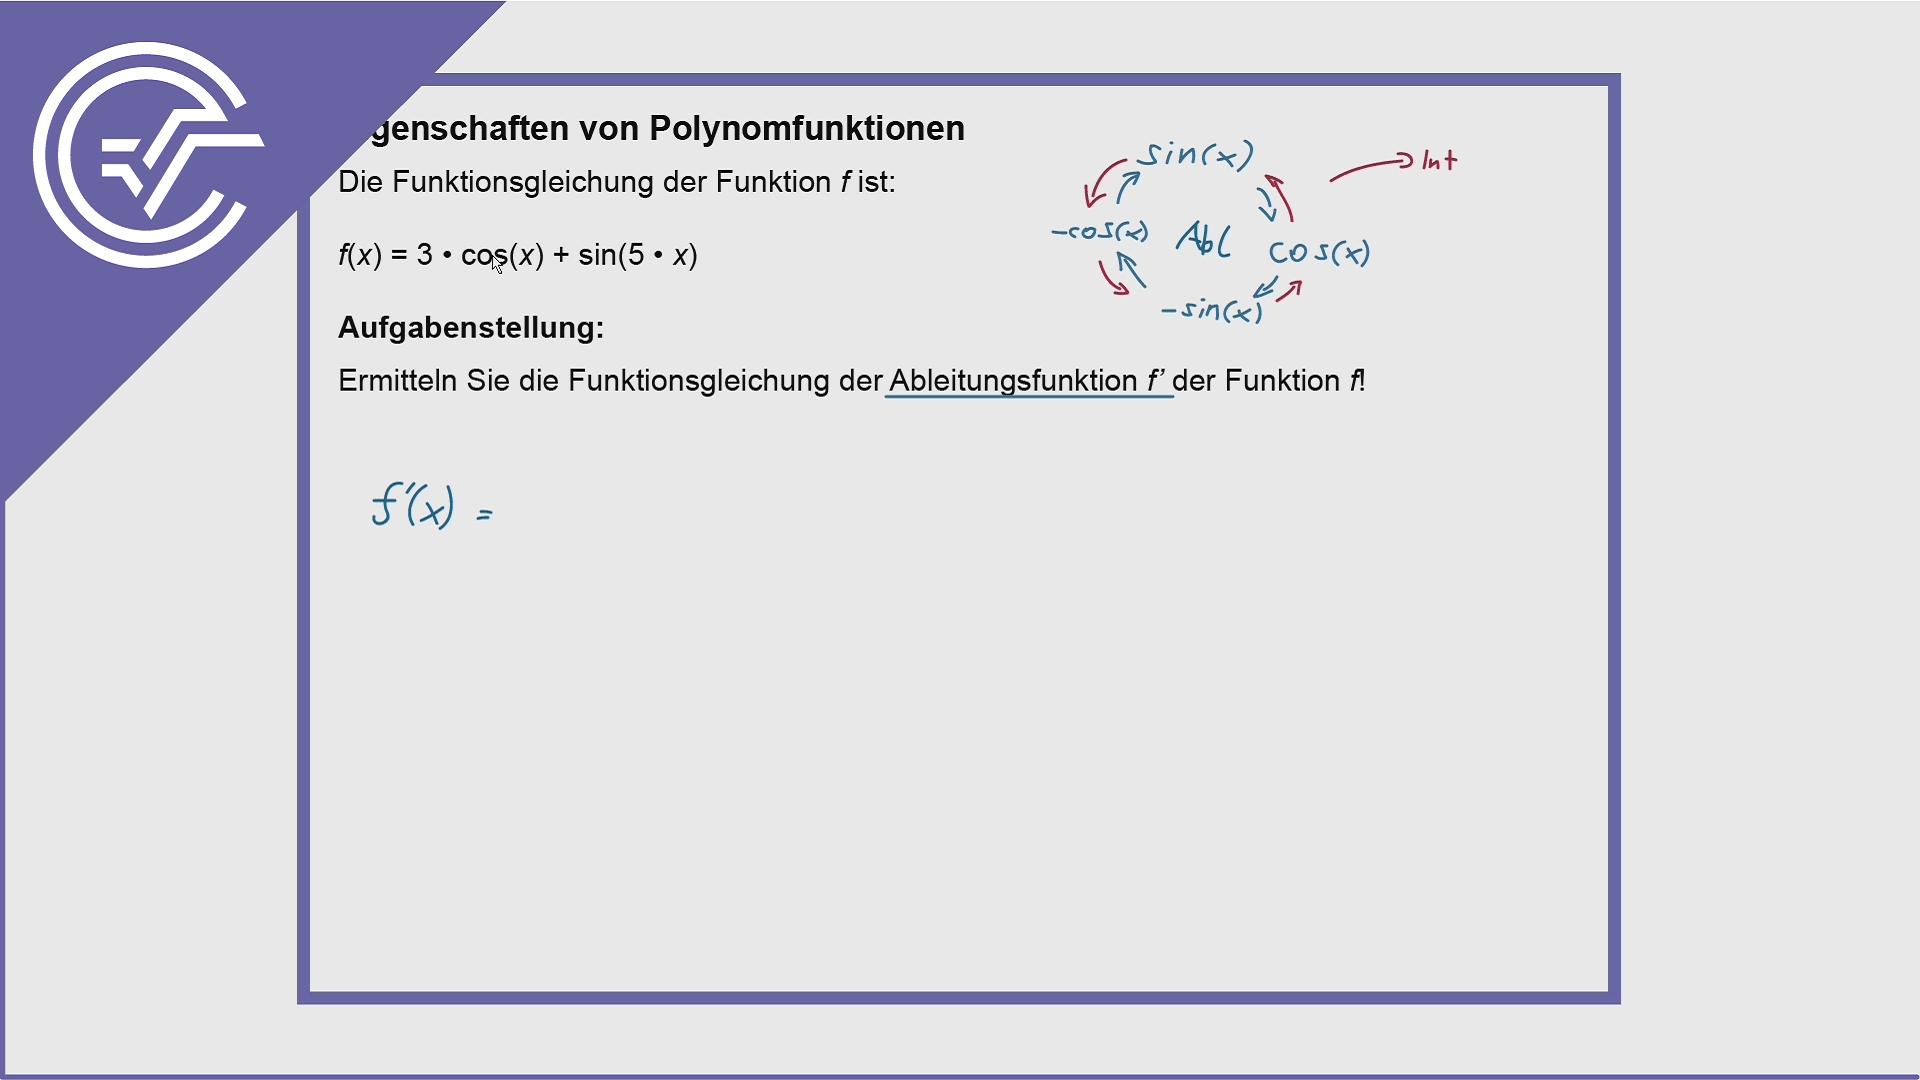 AHS Zentralmatura Aufgabe 14 - Sinus + Cosinus ableiten